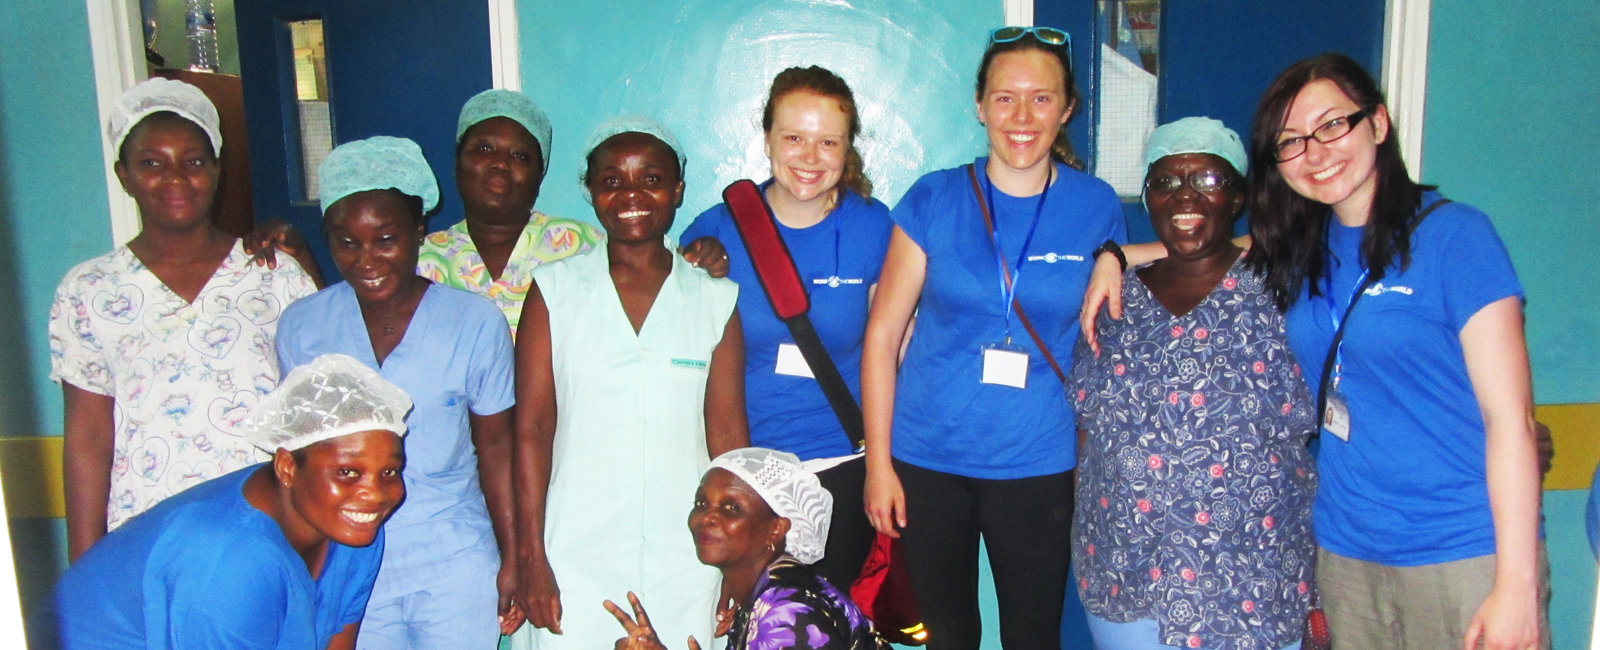 Kiriana Chabaniuk- Nursing Electives in Takoradi, Ghana